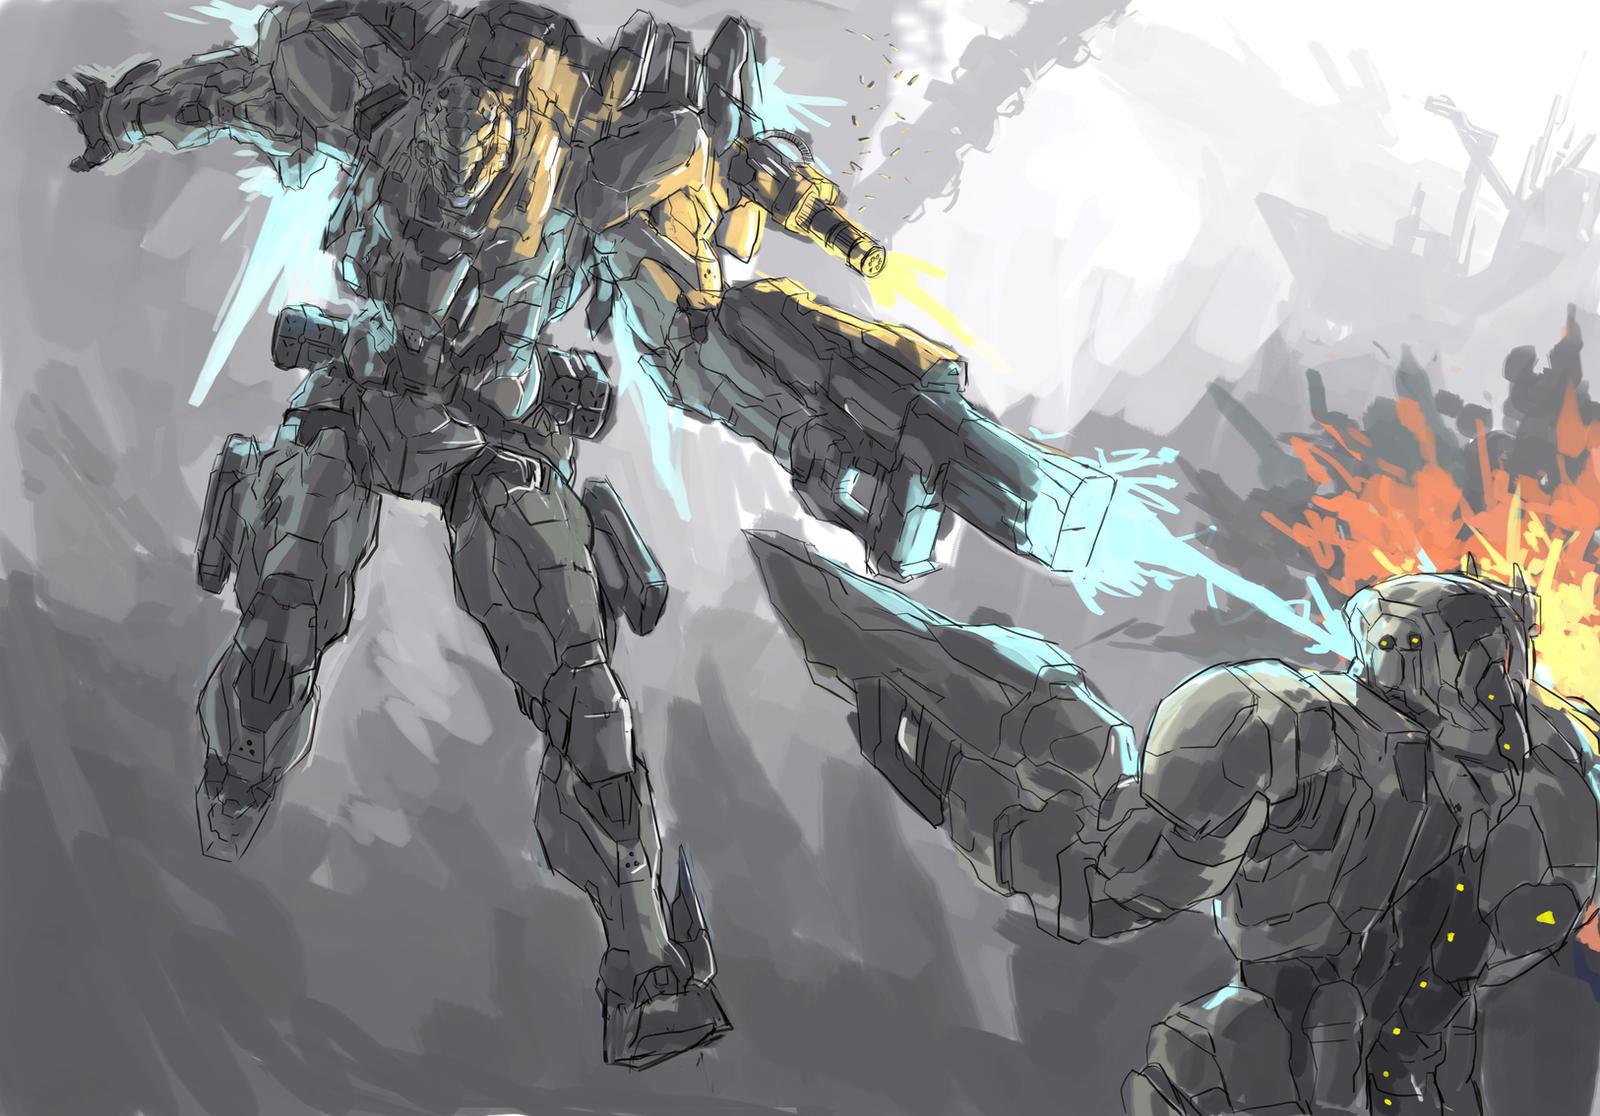 Mecha Battle in the Ash Lands by Frost7